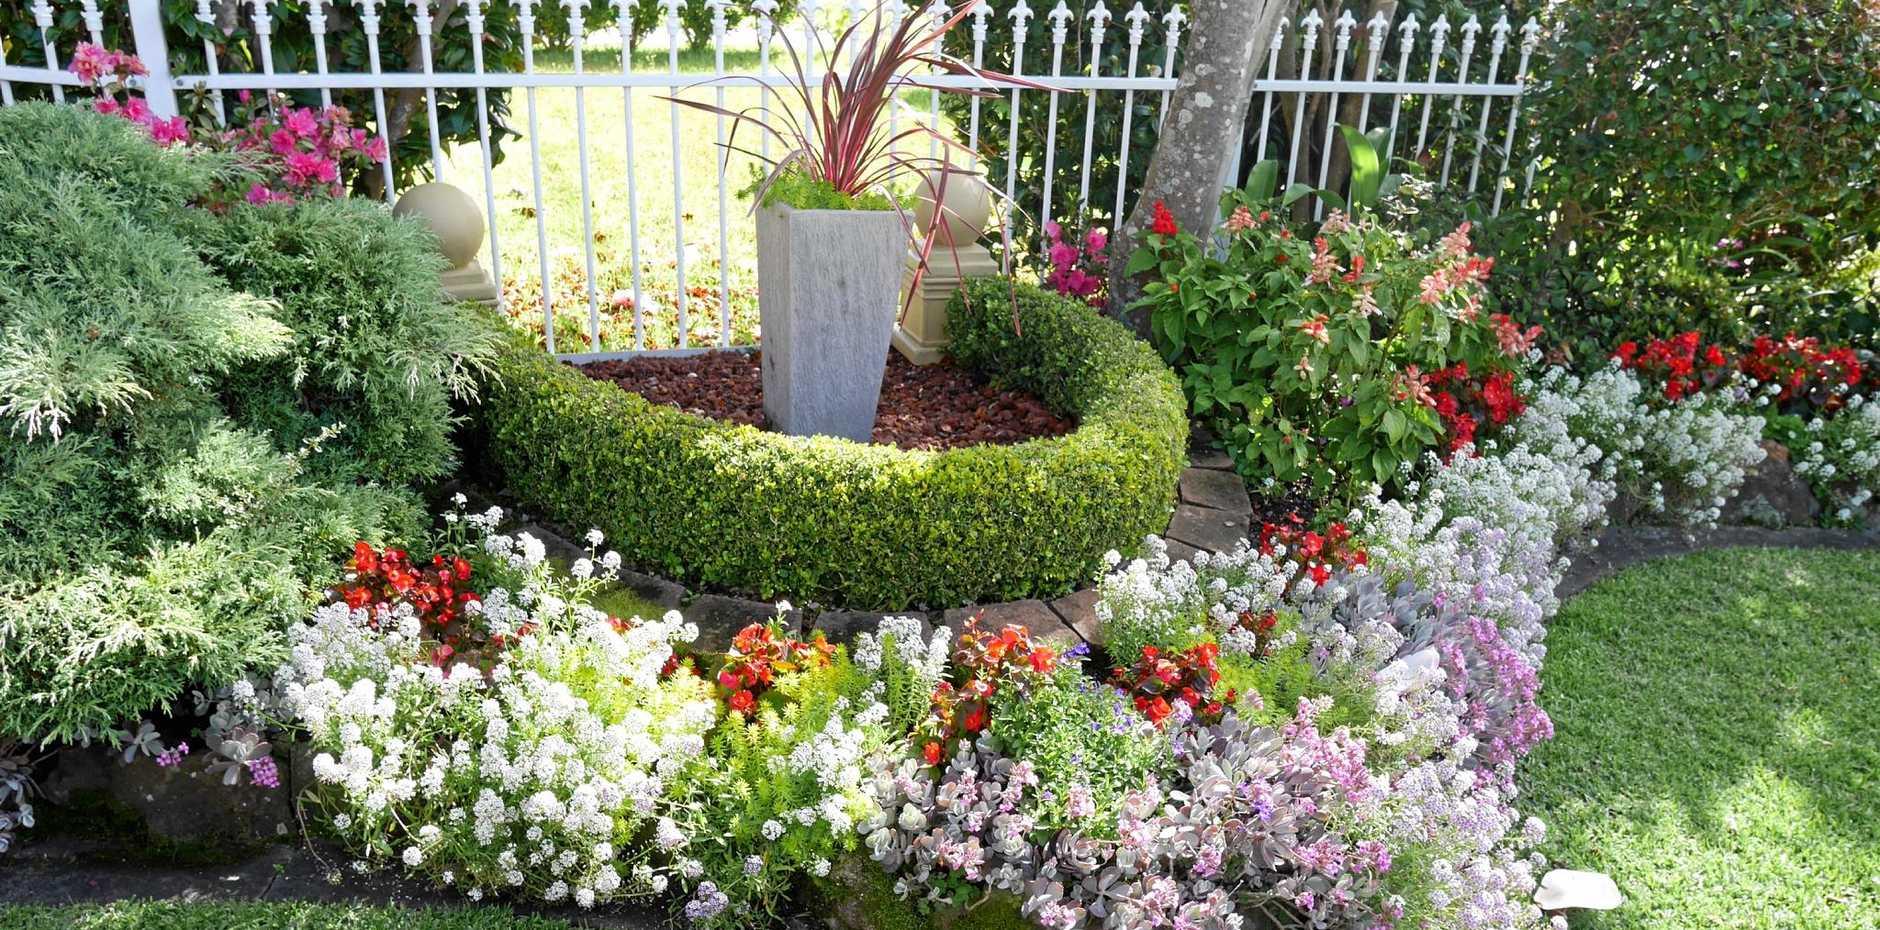 CHAMPION RESIDENTIAL : Alva Bell - Champion Residential Gardens Under 1000m2 .